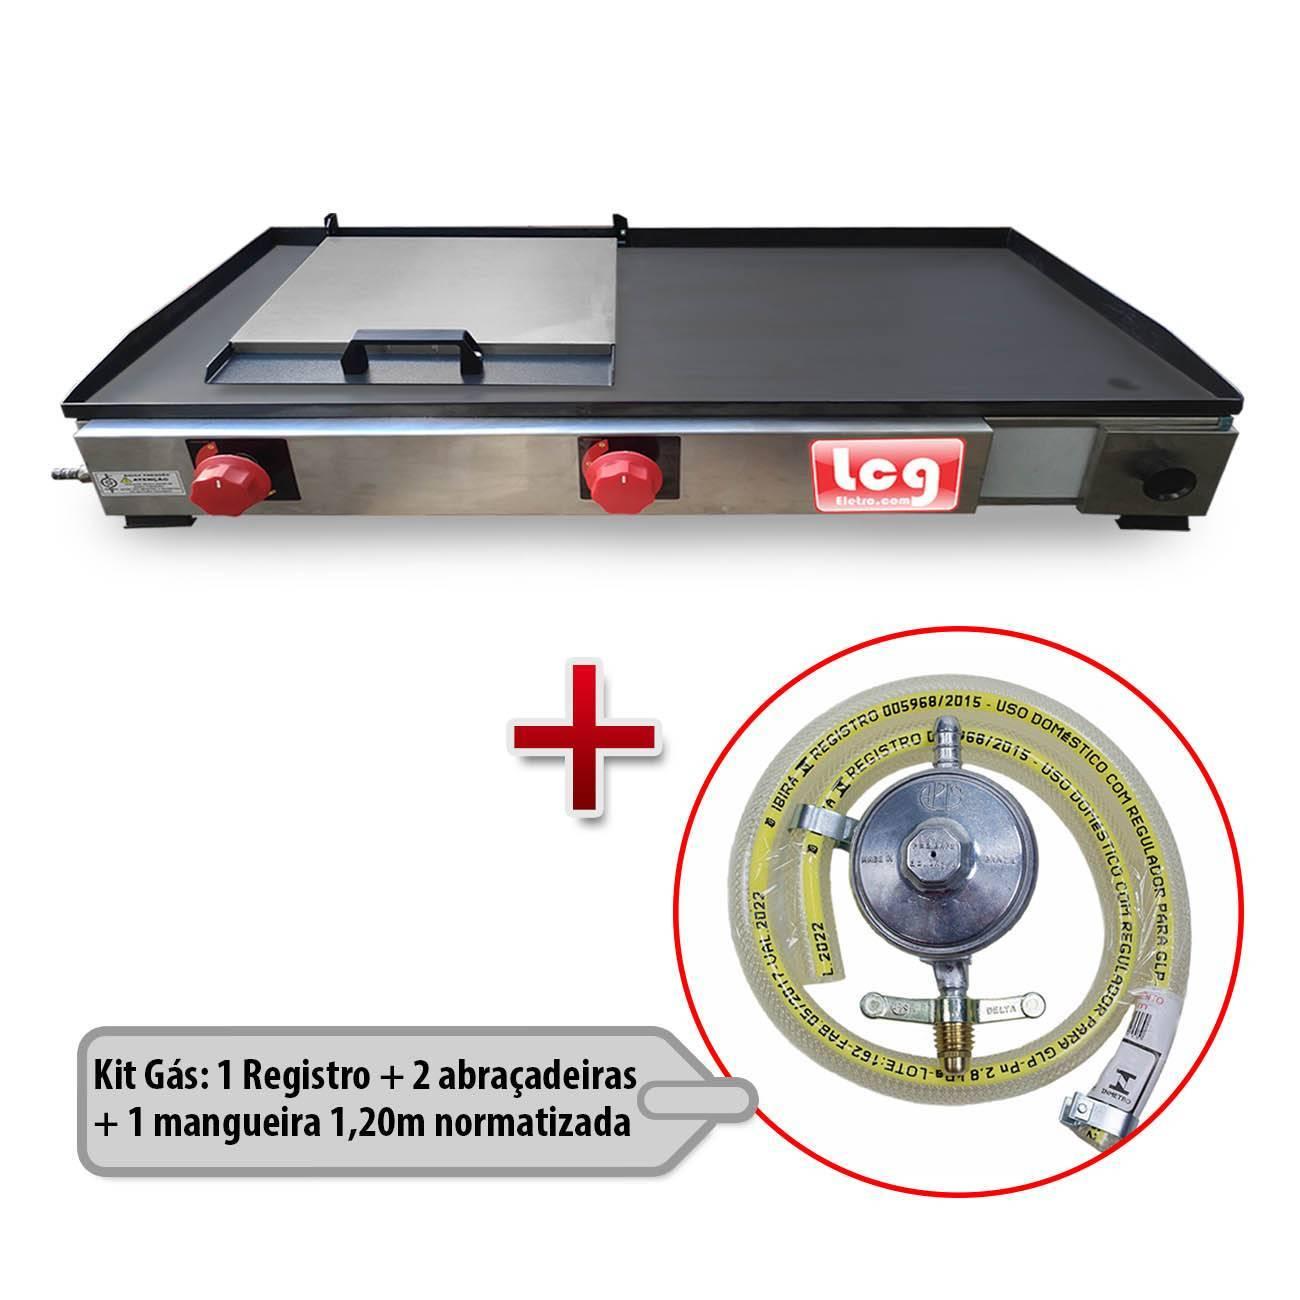 Chapa De Lanche A Gás Sanduicheira 40x80cm Lcg + Kit Gás - LCGELETRO